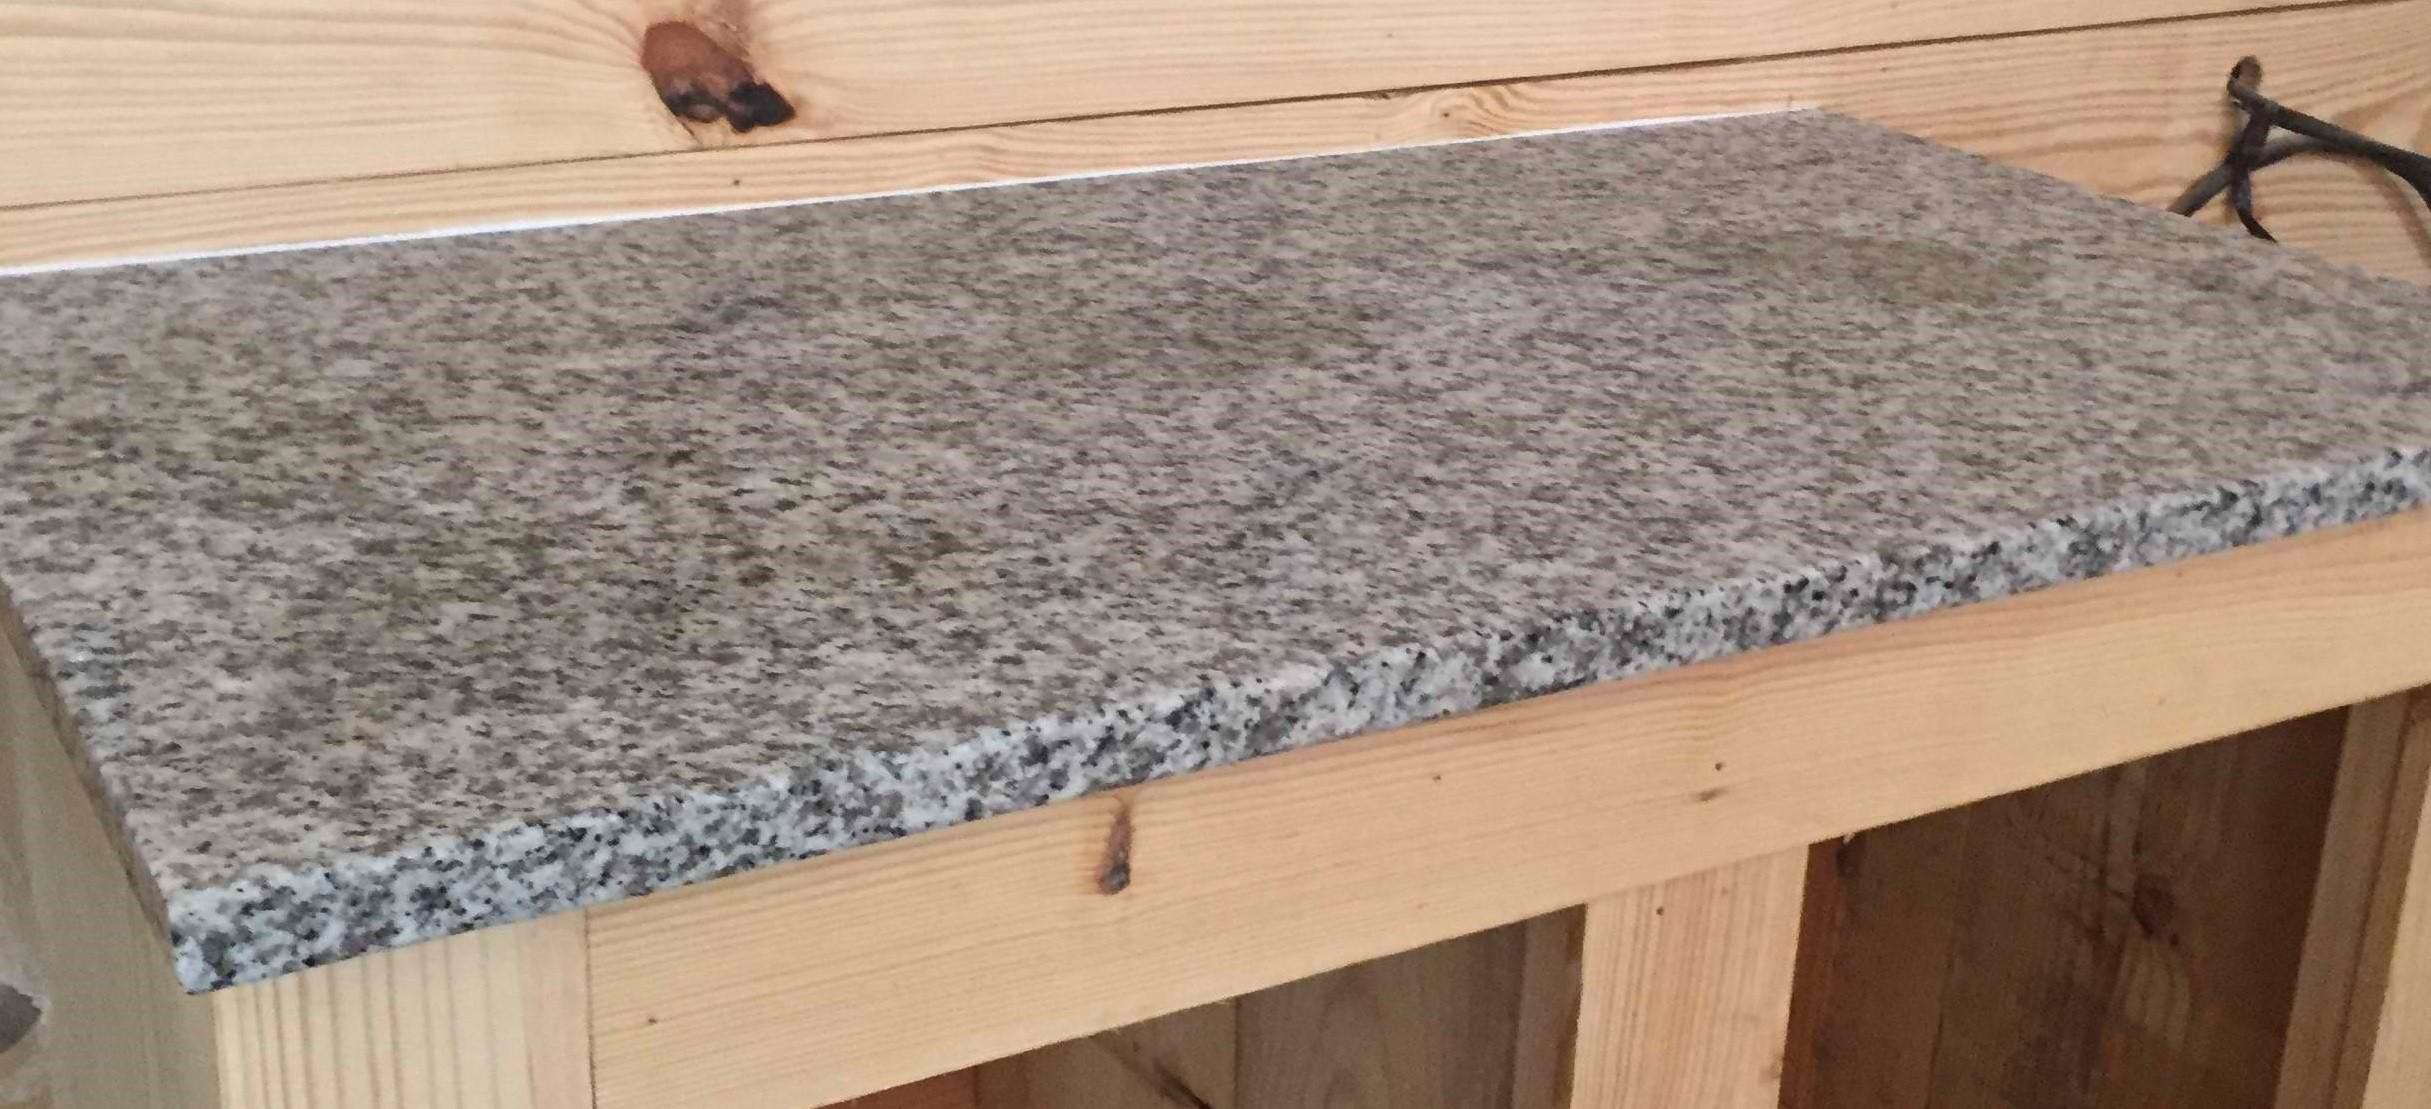 Beautiful Luna Pearl Granite Countertop For Kitchen Or Bathroom